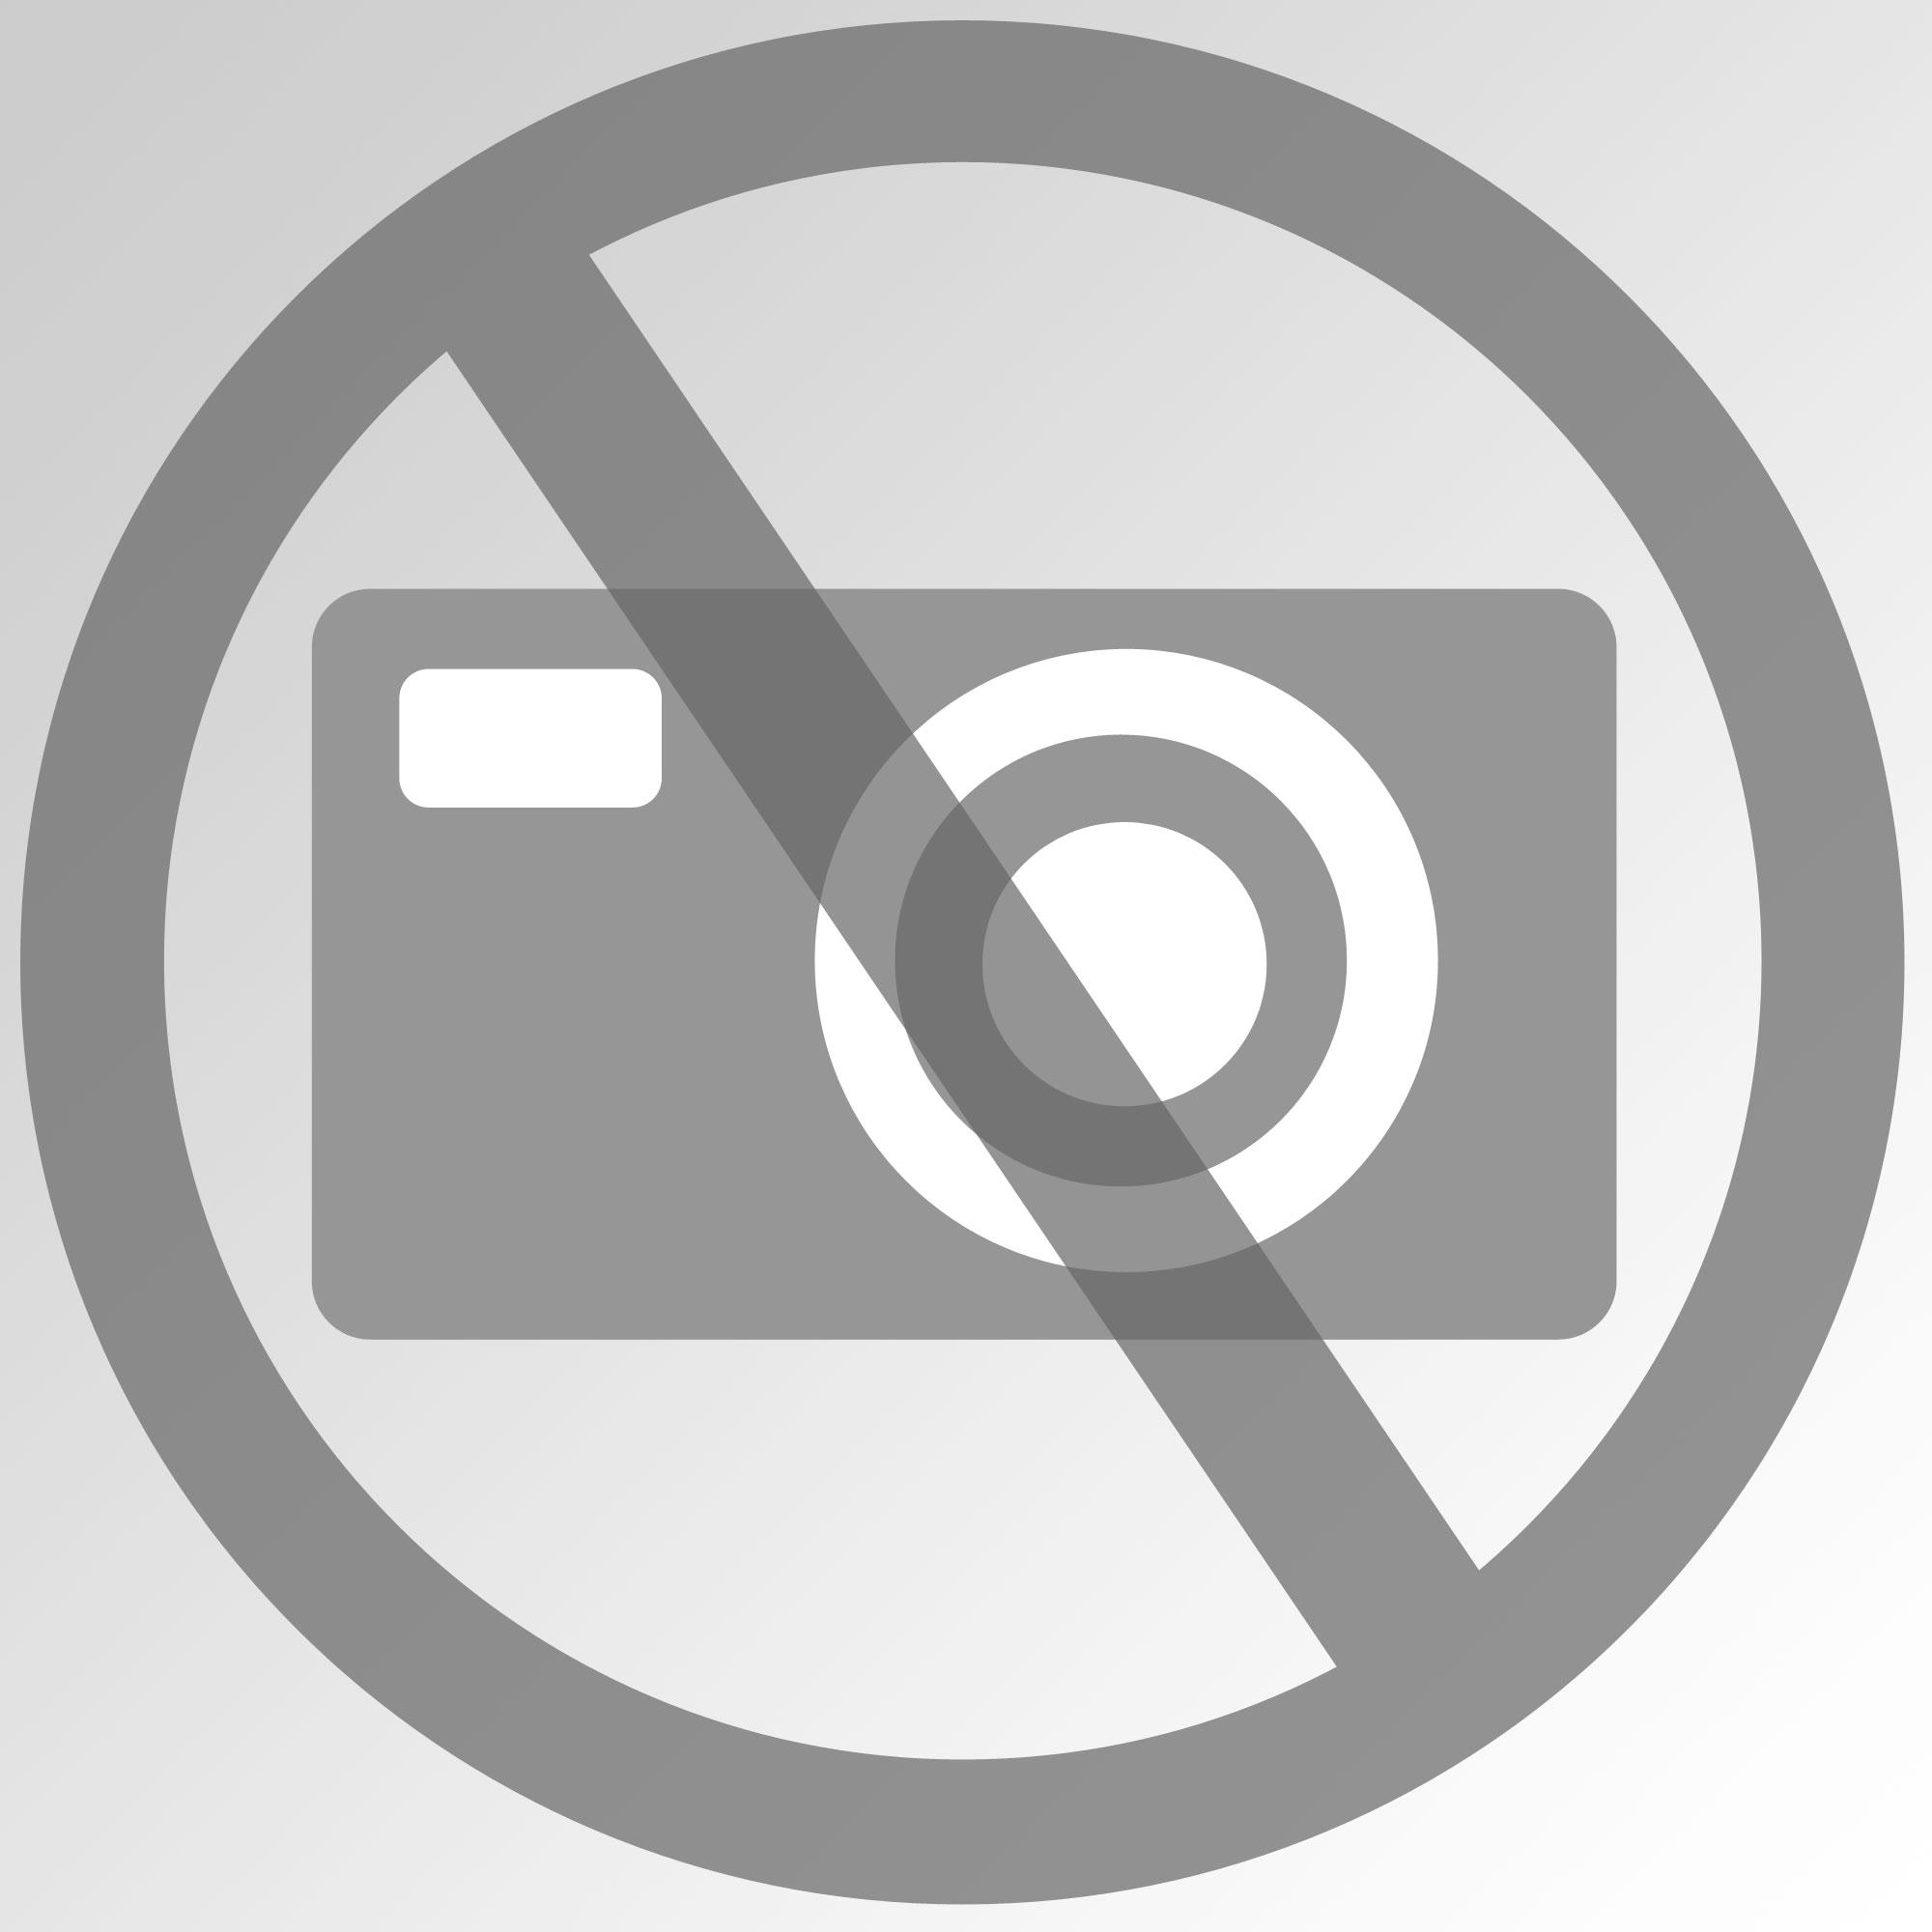 Nölle Stiel roh, 28 mm Ø, 140 cm lang mit Sonderkonus